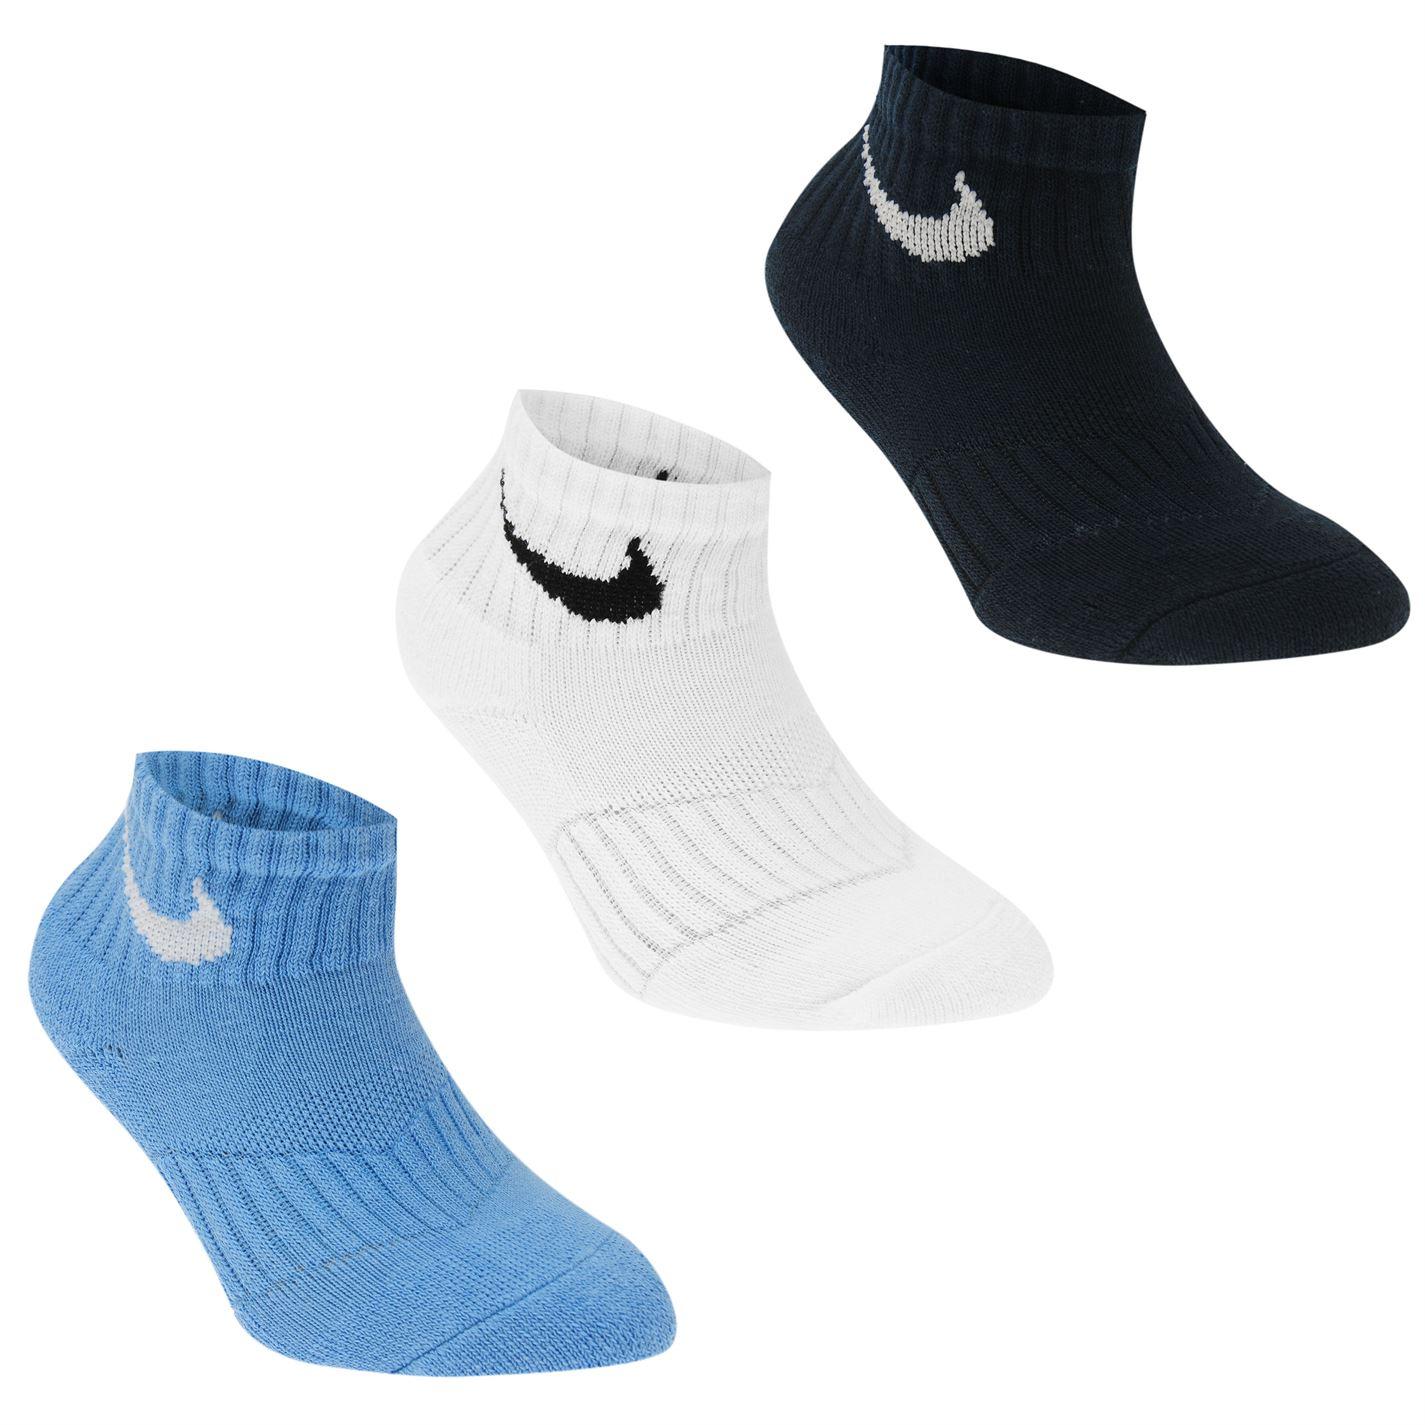 2ccdf0efb1f Ponožky Nike Swoosh Quarter Socks Pack of 3 Childrens - Glami.cz